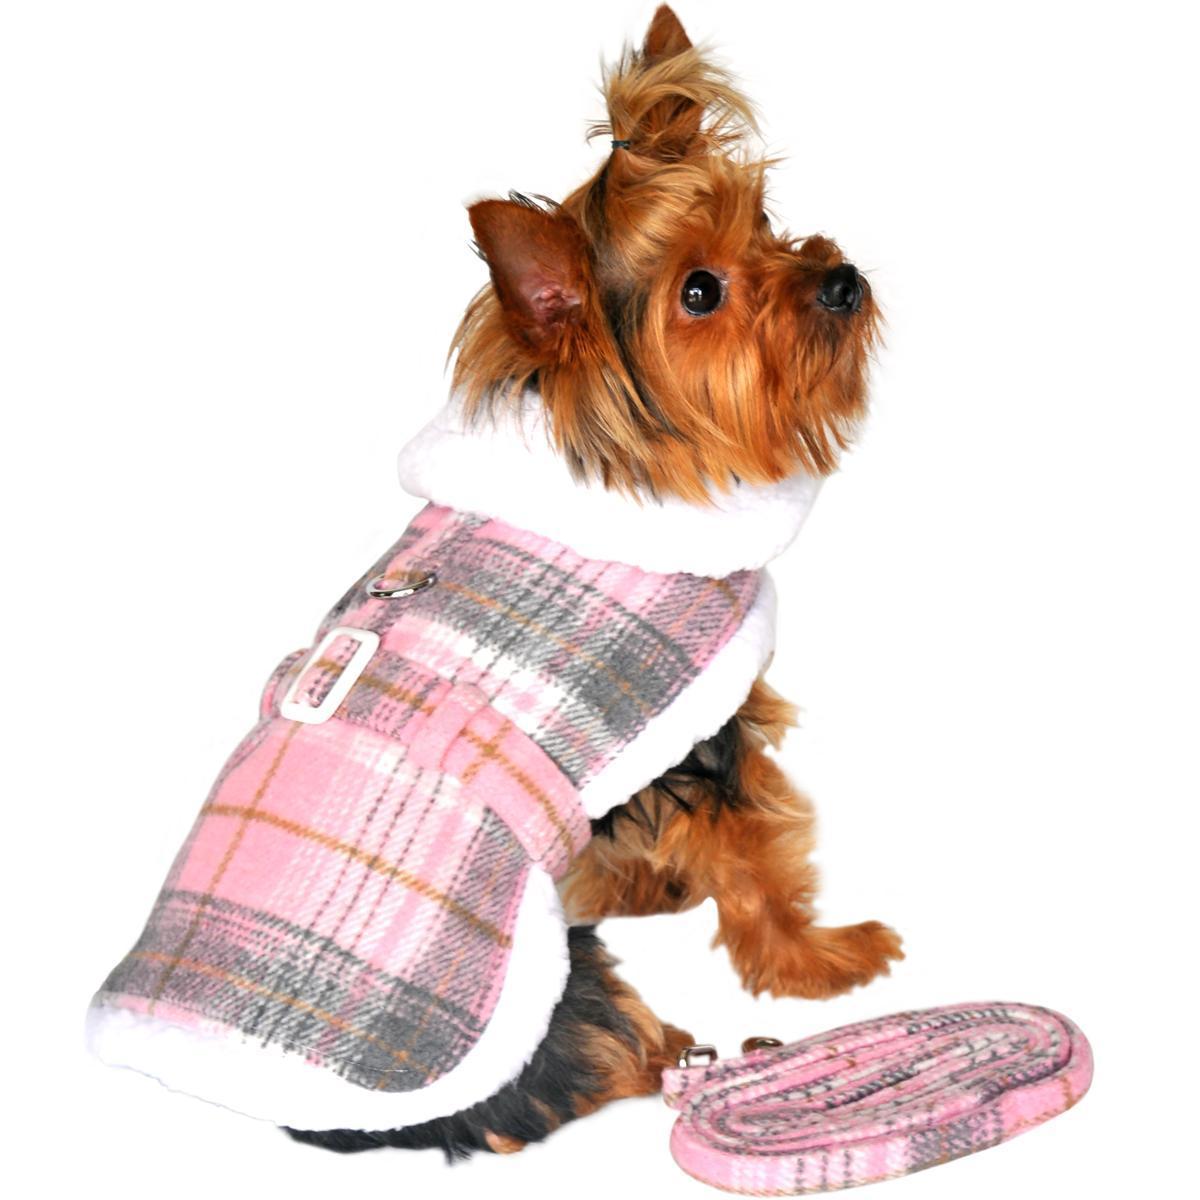 Doggie Design Plaid Sherpa Fleece Lined Dog Harness Coat - Pink & White